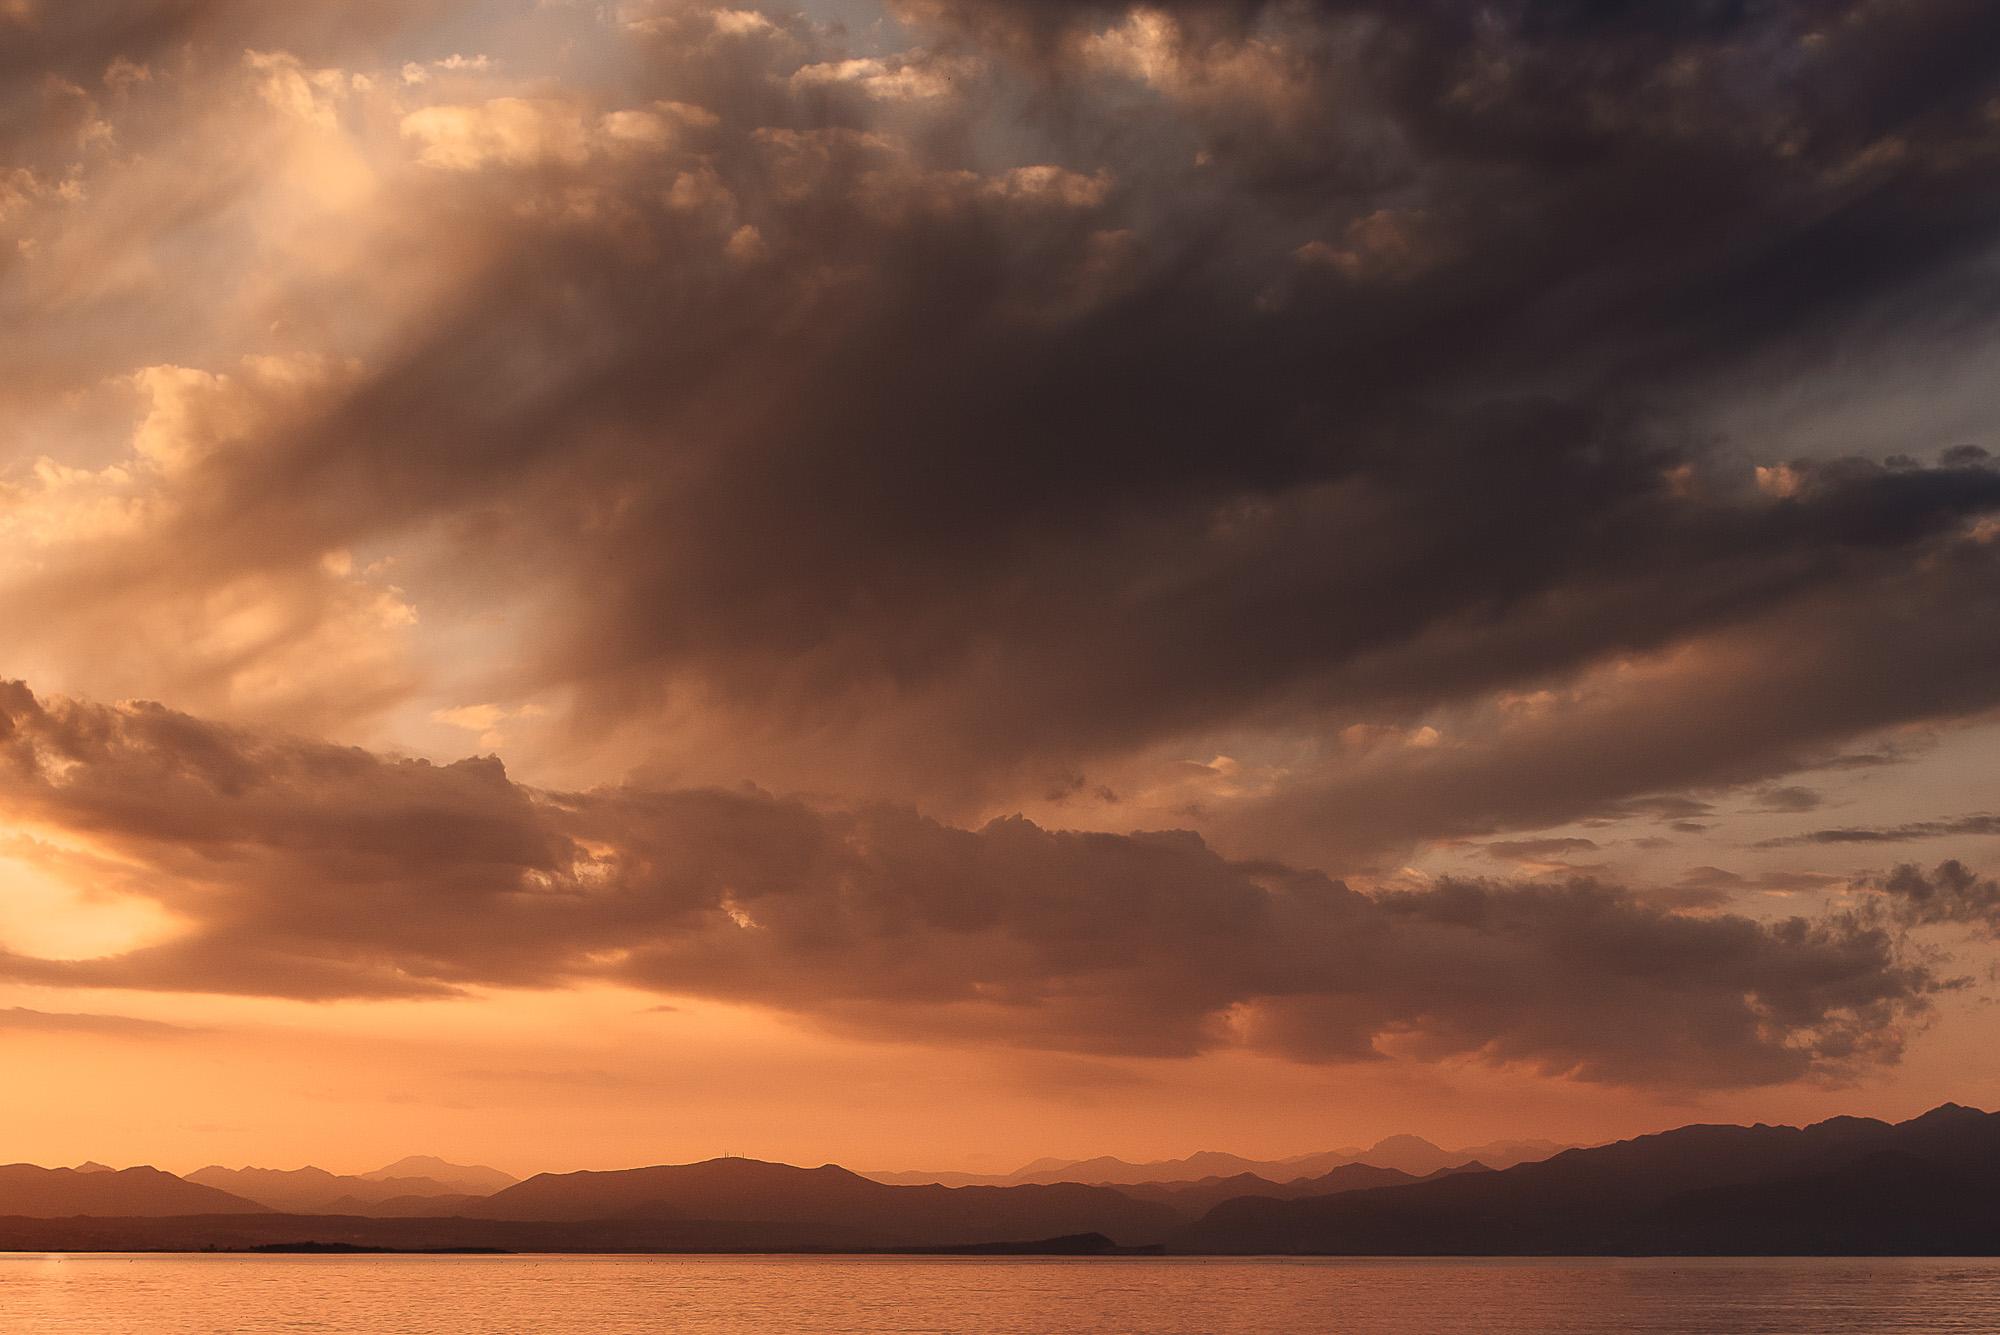 OurBeautifulAdventure-LakeGarda-Italy-Blog-3.jpg